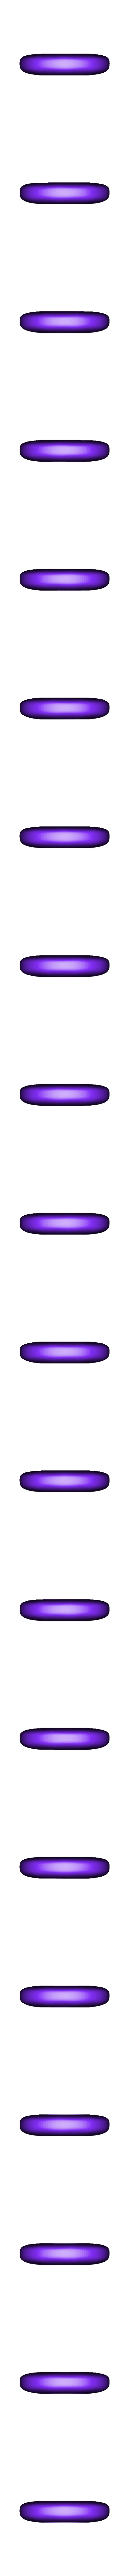 6-Body-Top.stl Download free STL file Bath and Body Works - Candle Holder (10cm Ø) • 3D print design, crisonescu